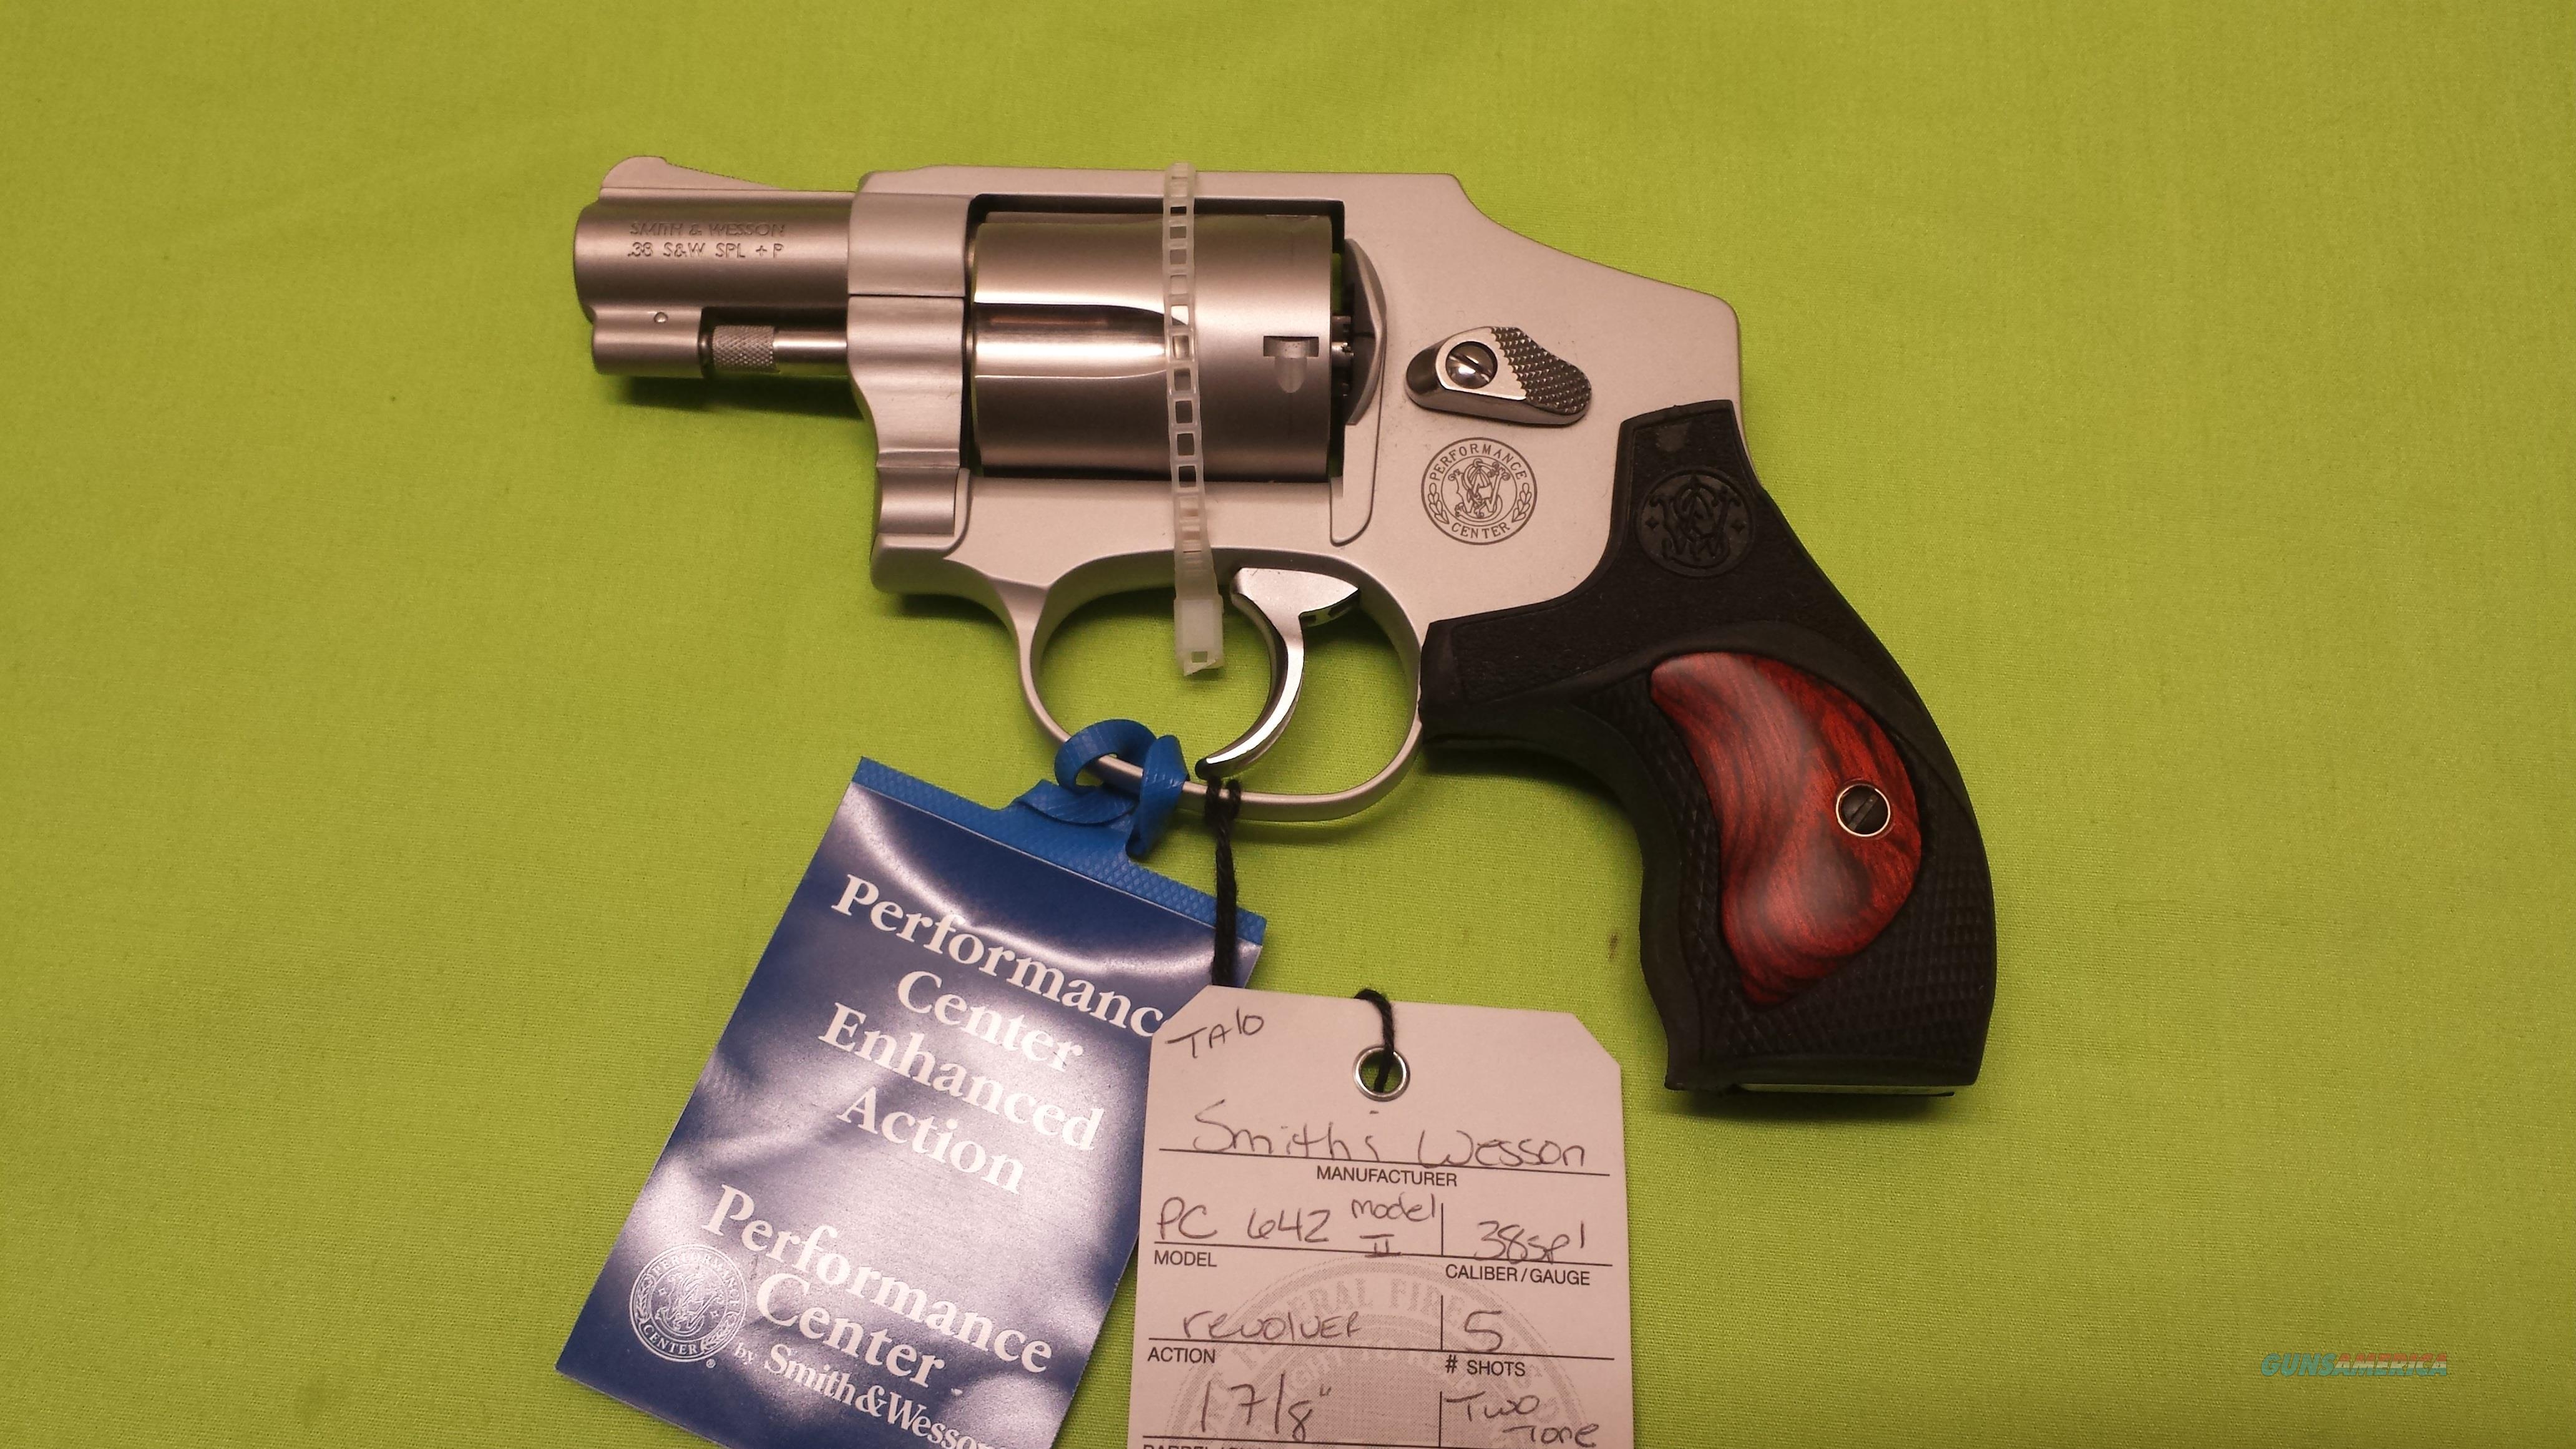 S&W 642 PC 38 38SPL SS WOOD PERFORMANCE MODEL II  Guns > Pistols > Smith & Wesson Revolvers > Performance Center